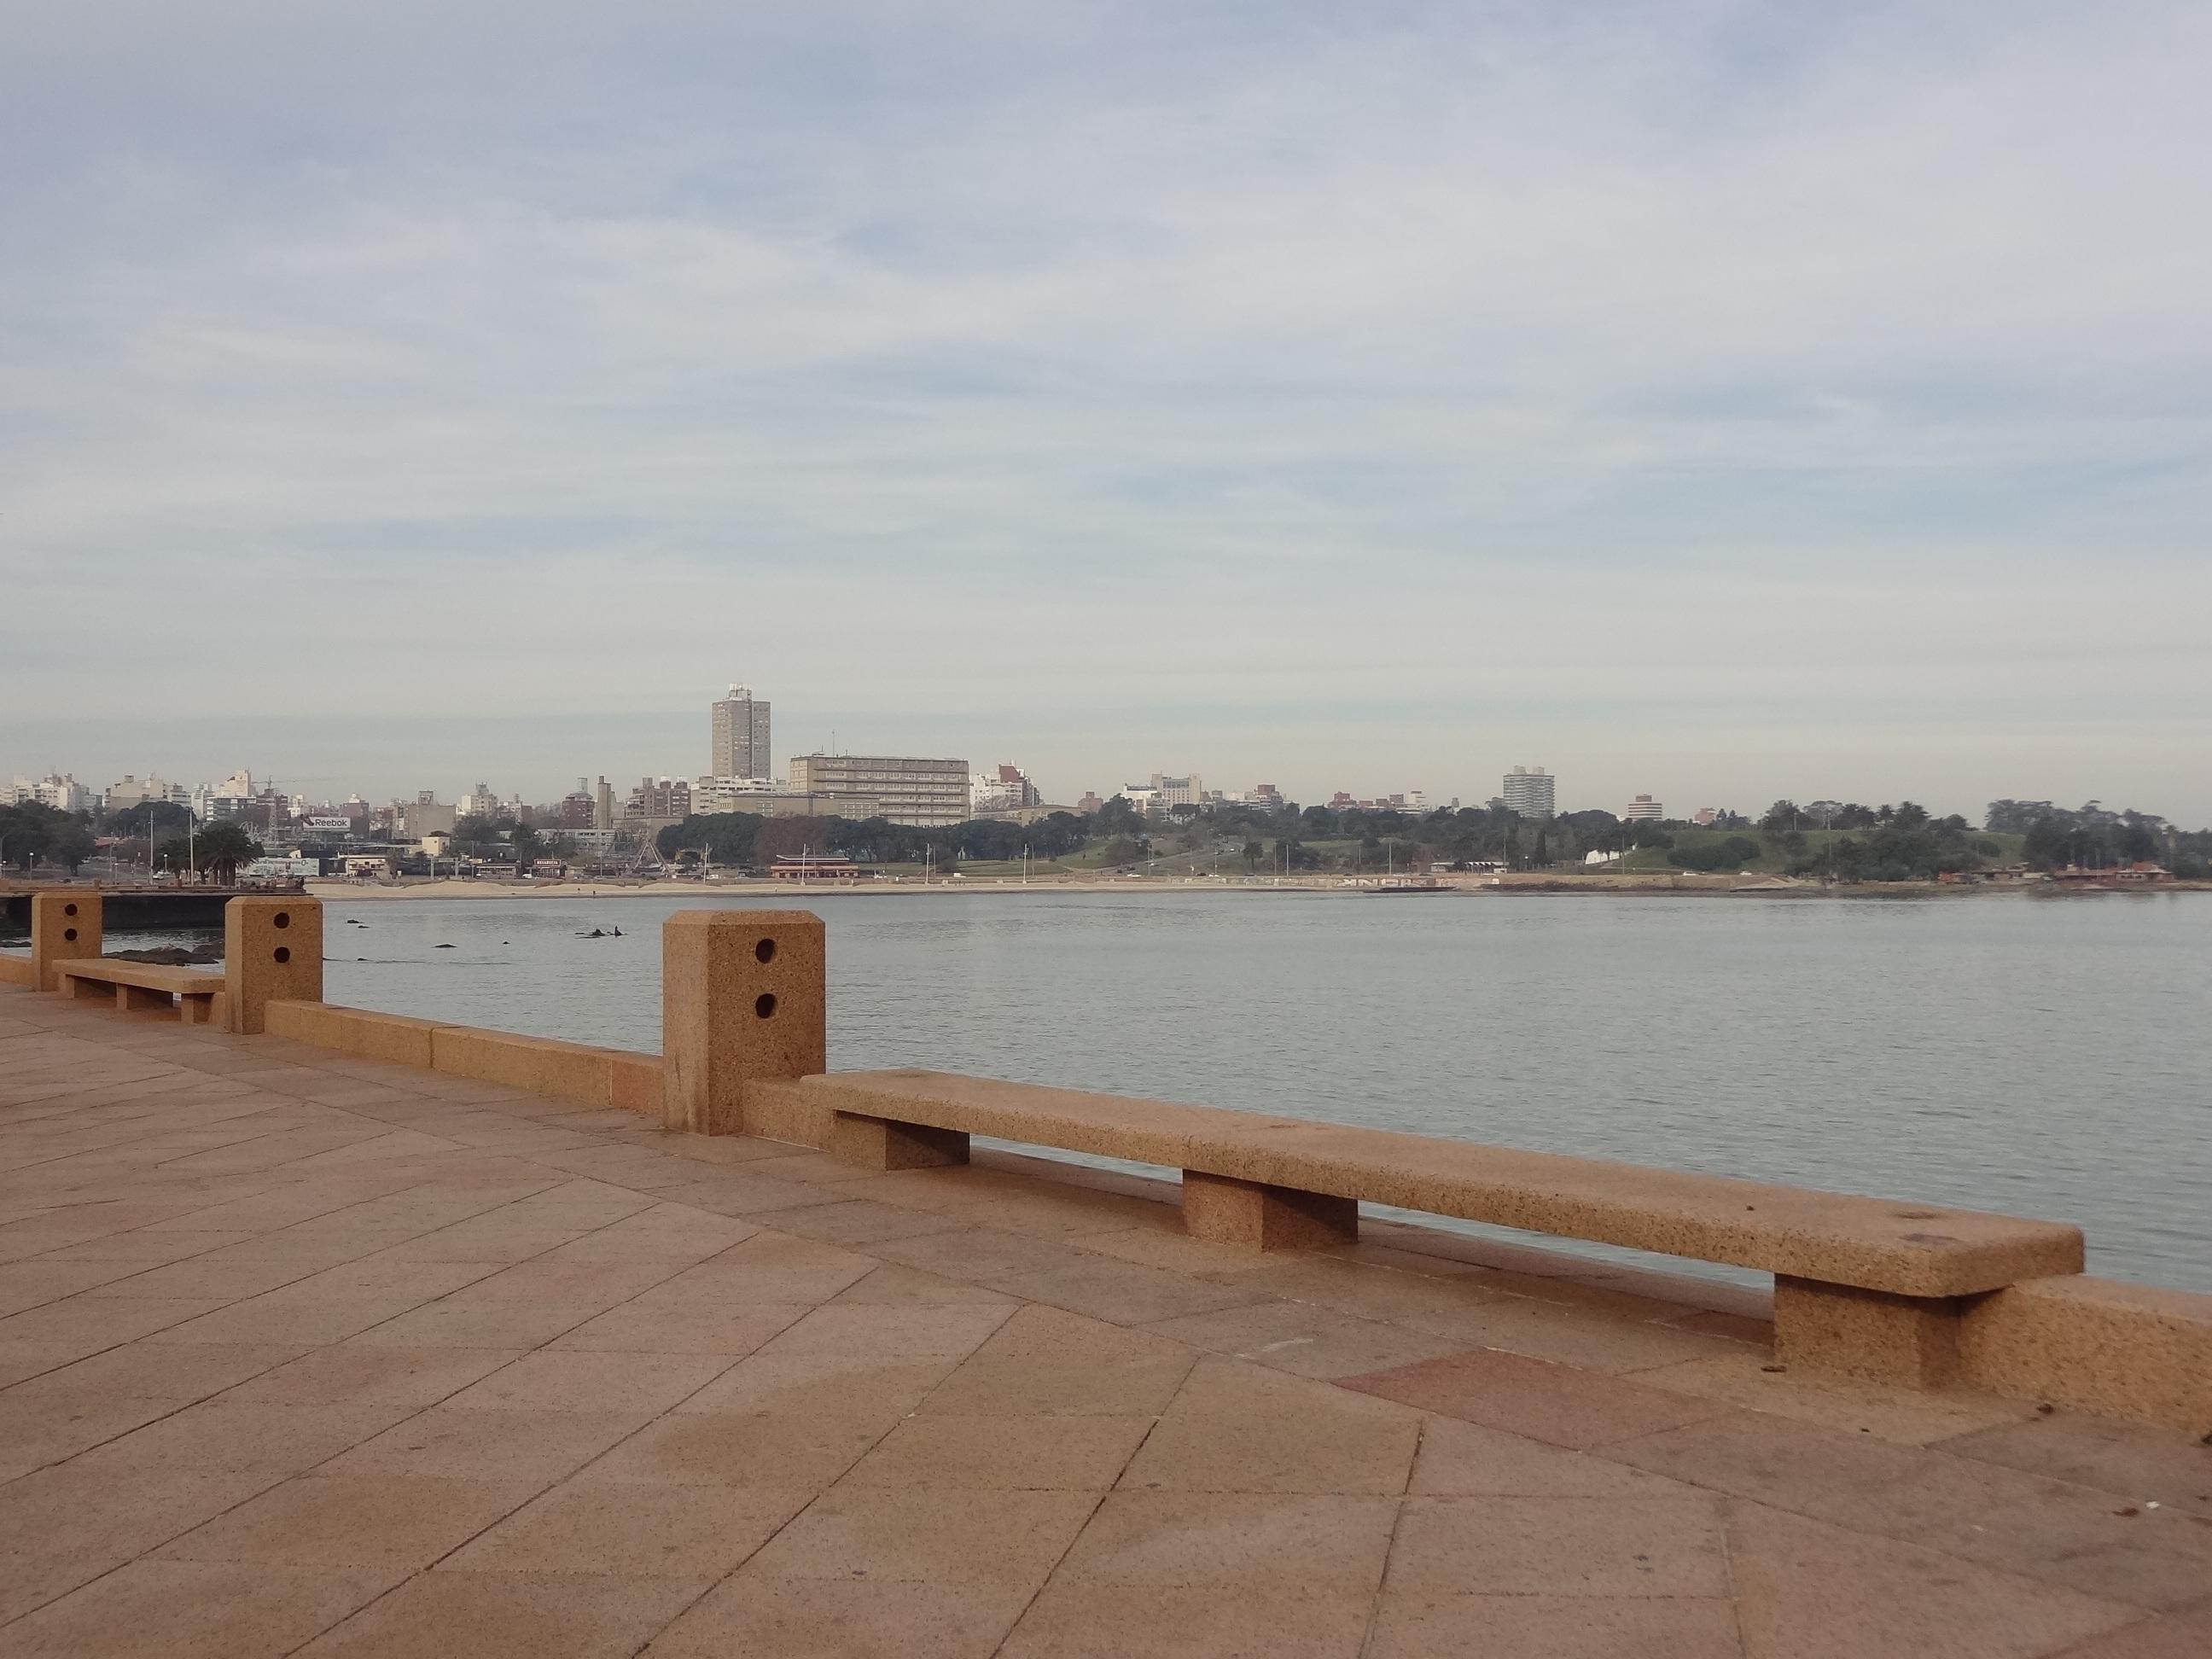 Uruguai-Montevideu-La-Rambla-Roteiro-Turismo Montevidéu - Conheça a Capital do Uruguai